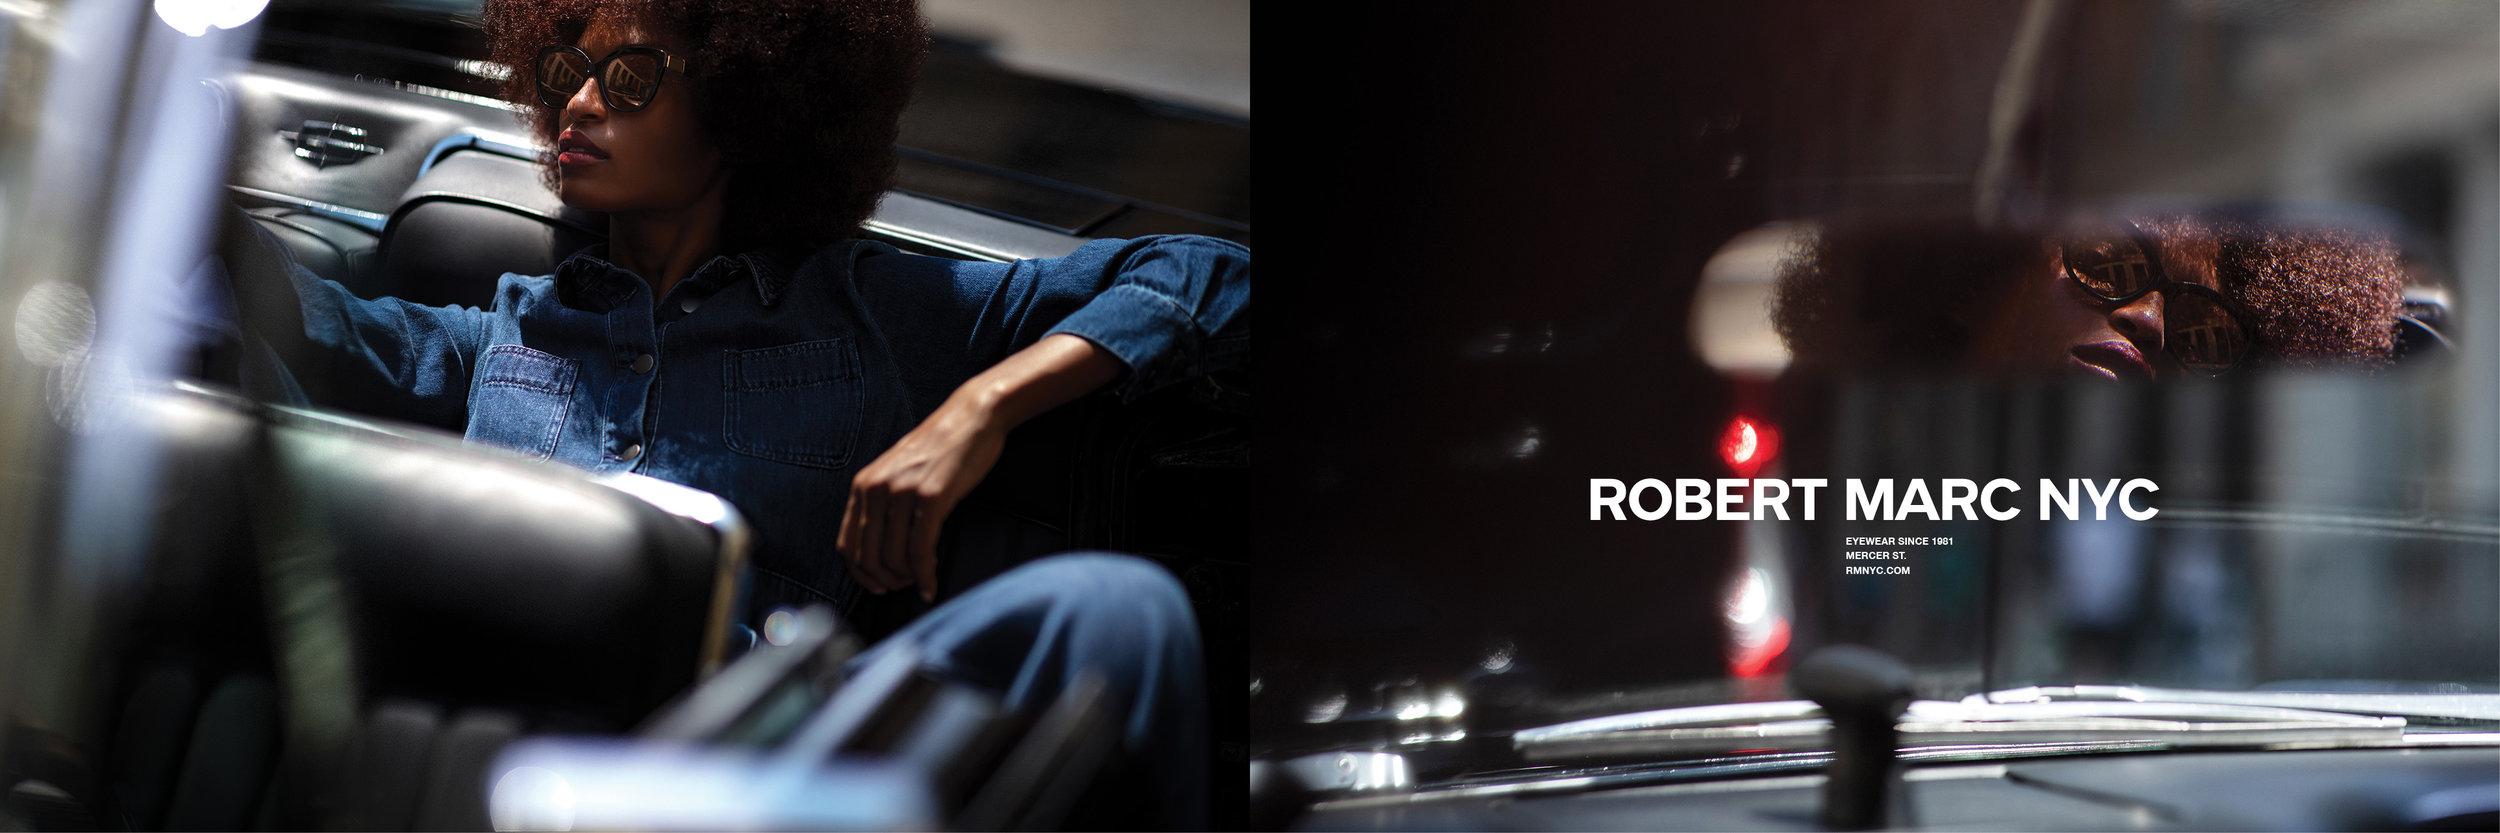 Robert Marc Campaign 2018